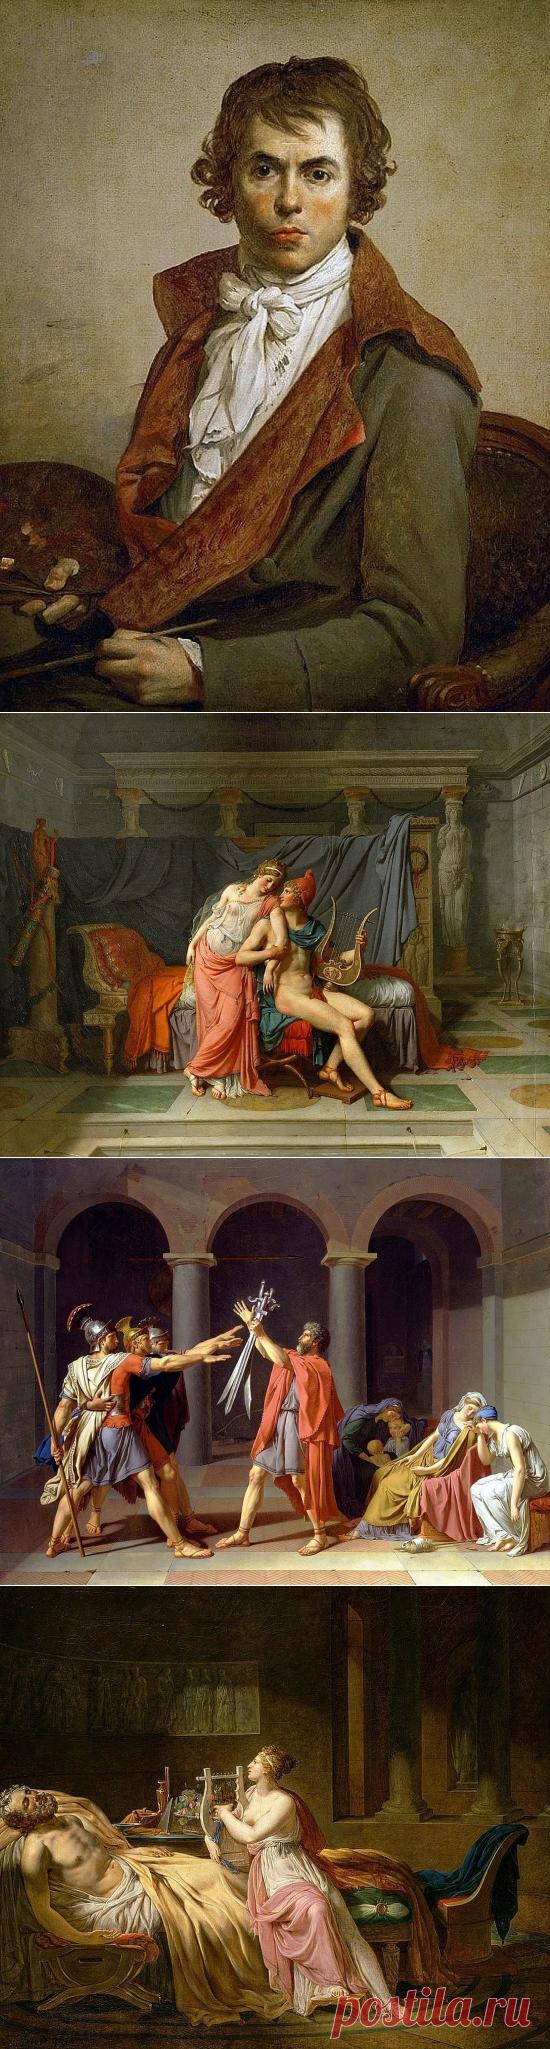 Художник Жак-Луи Давид (Jacques-Louis David) | Картины